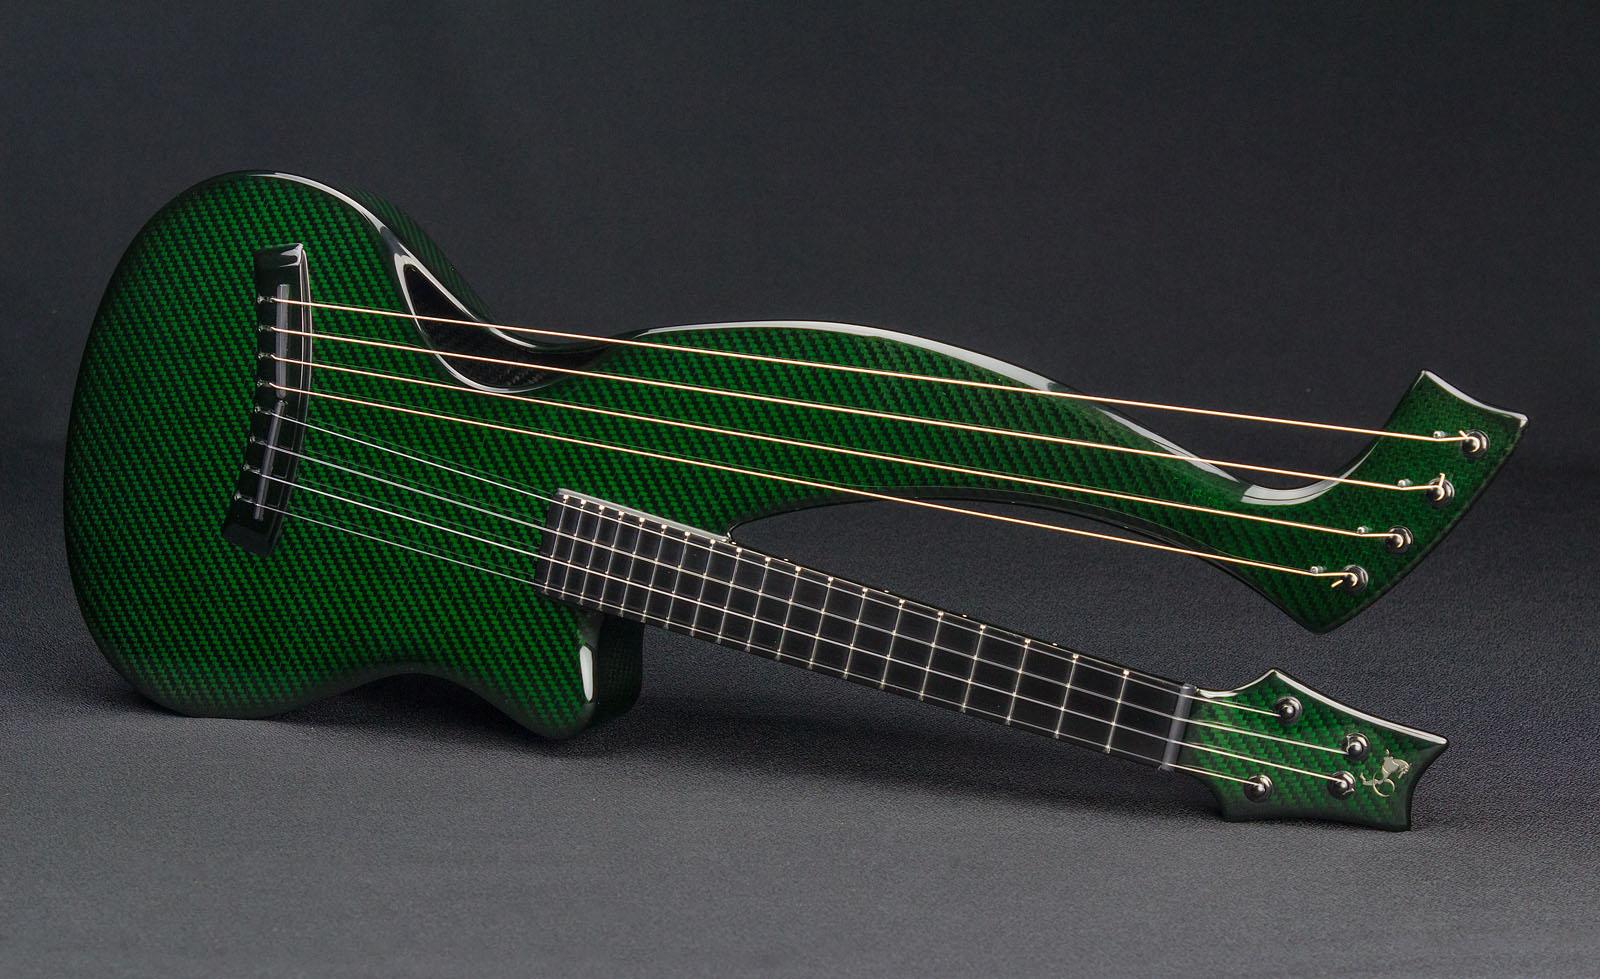 Short scale guitar Amicus Emerald Guitars